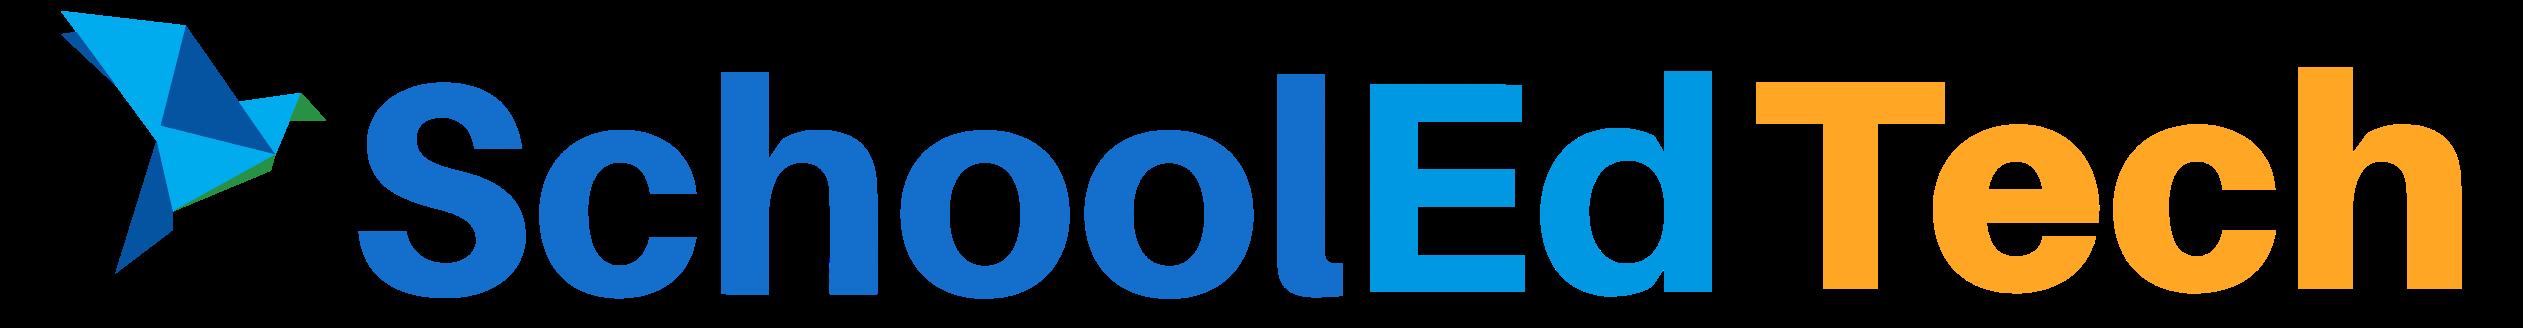 School EdTech